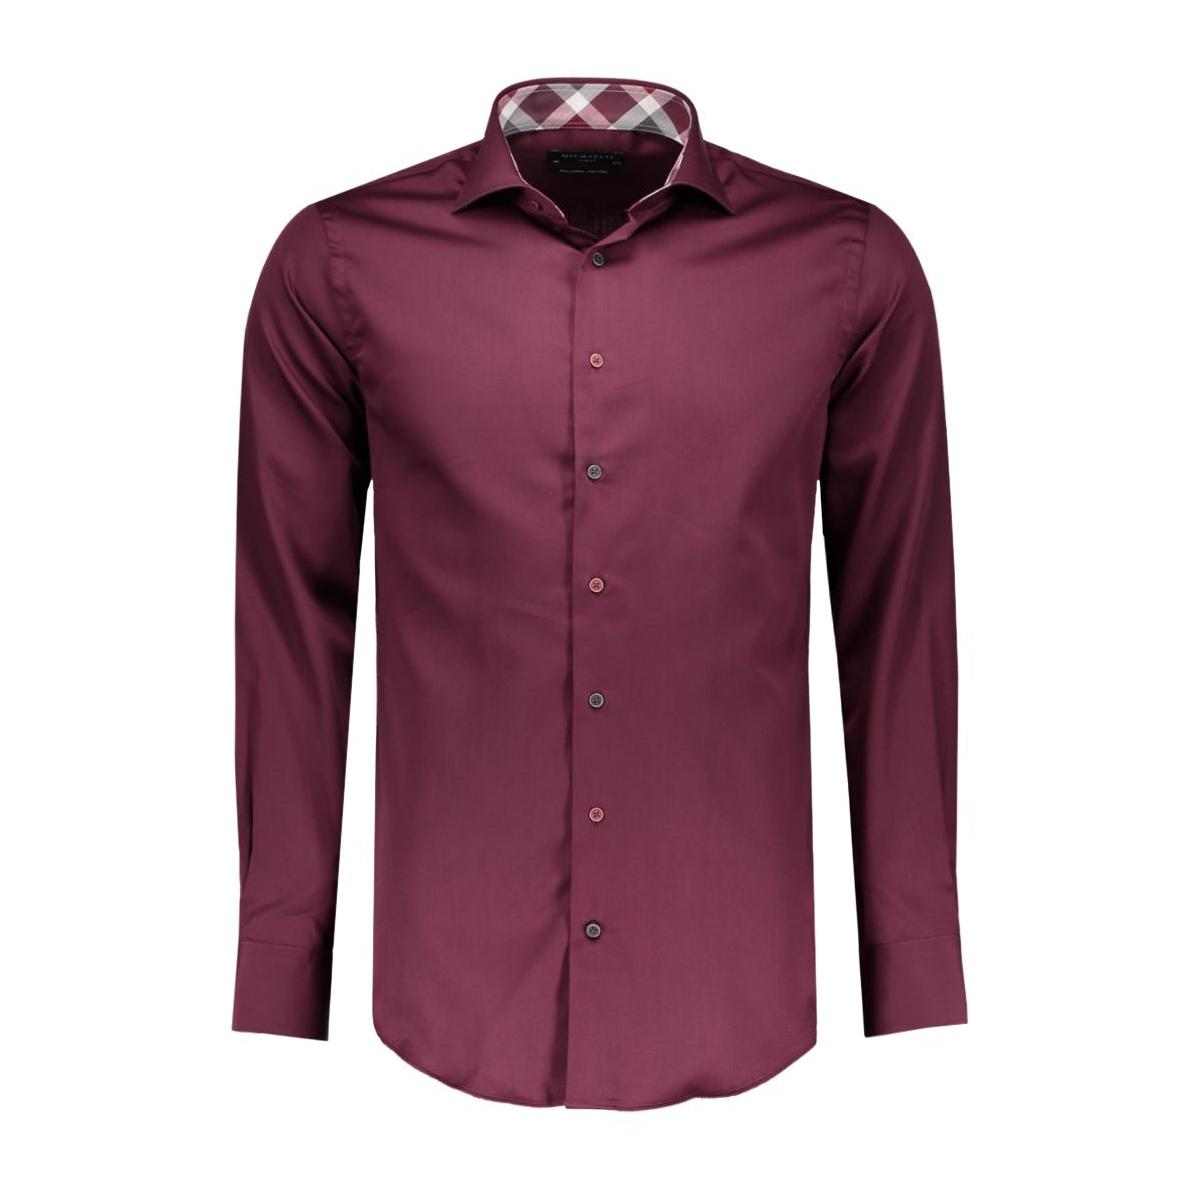 pmnh300025 michaelis overhemd bordeaux